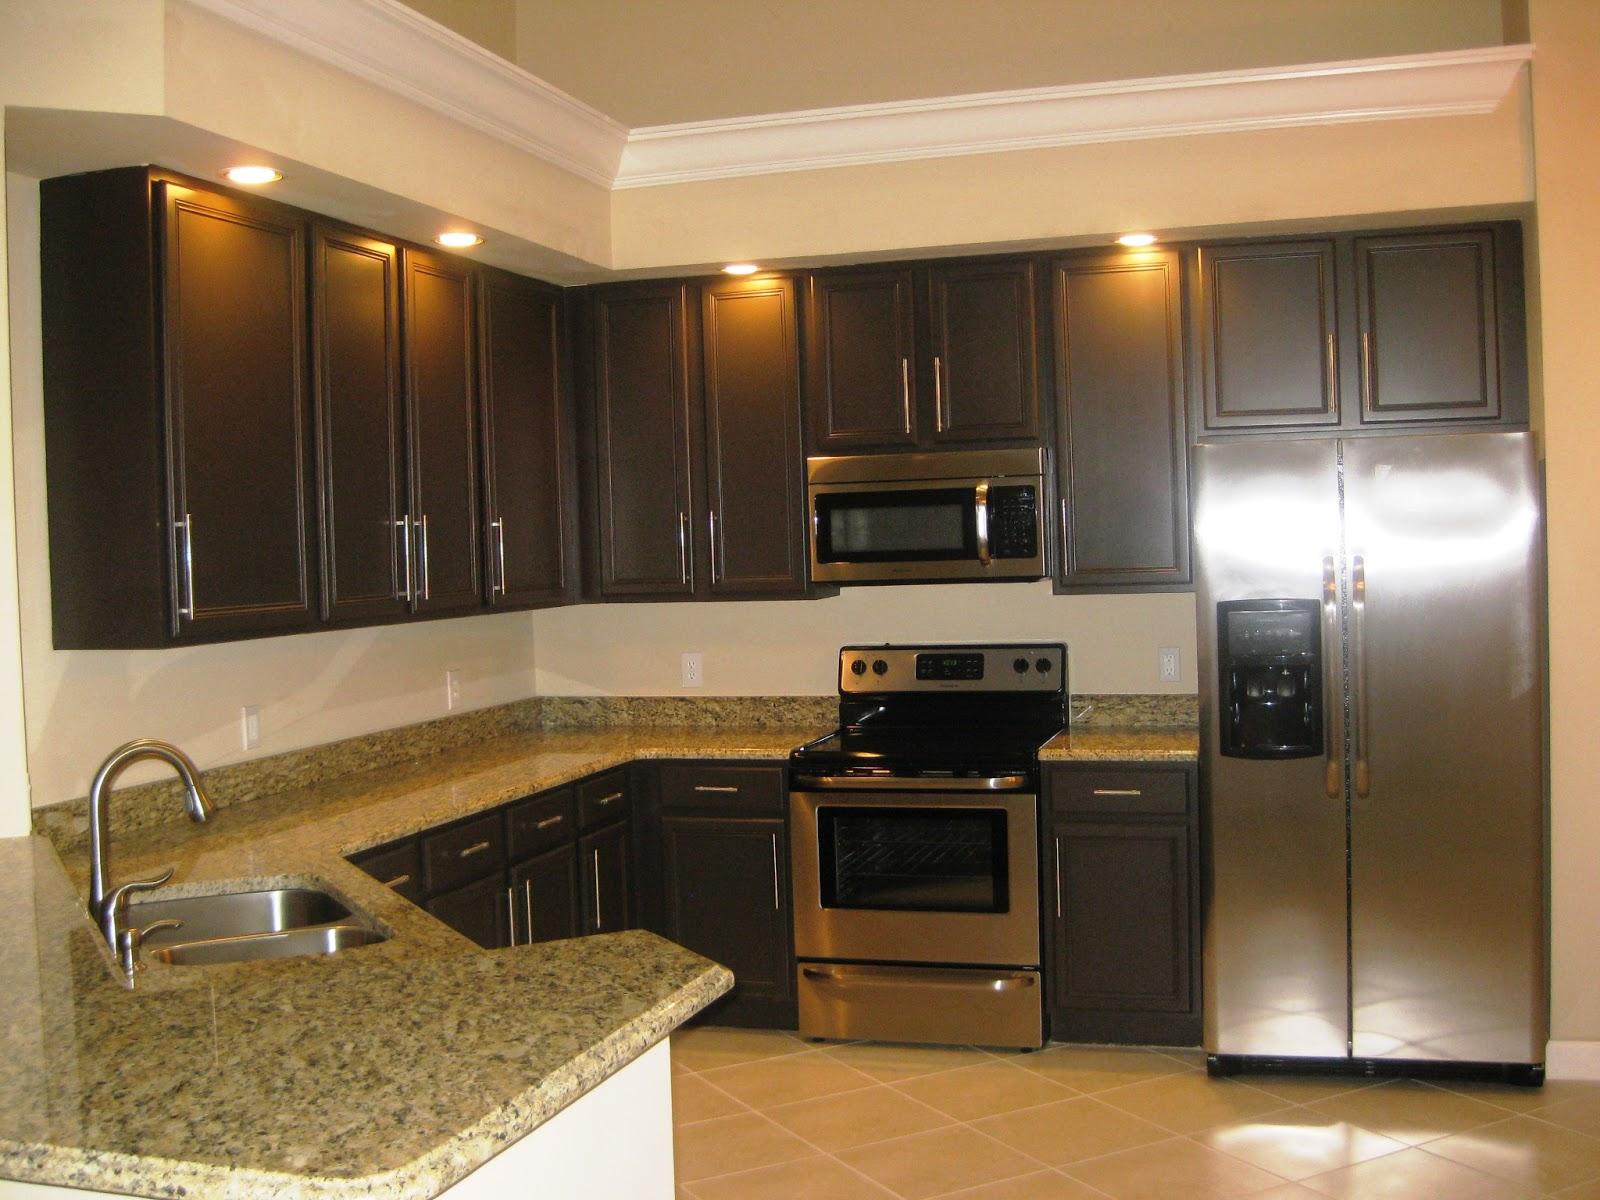 5 favorite types of granite countertops for stunning kitchen